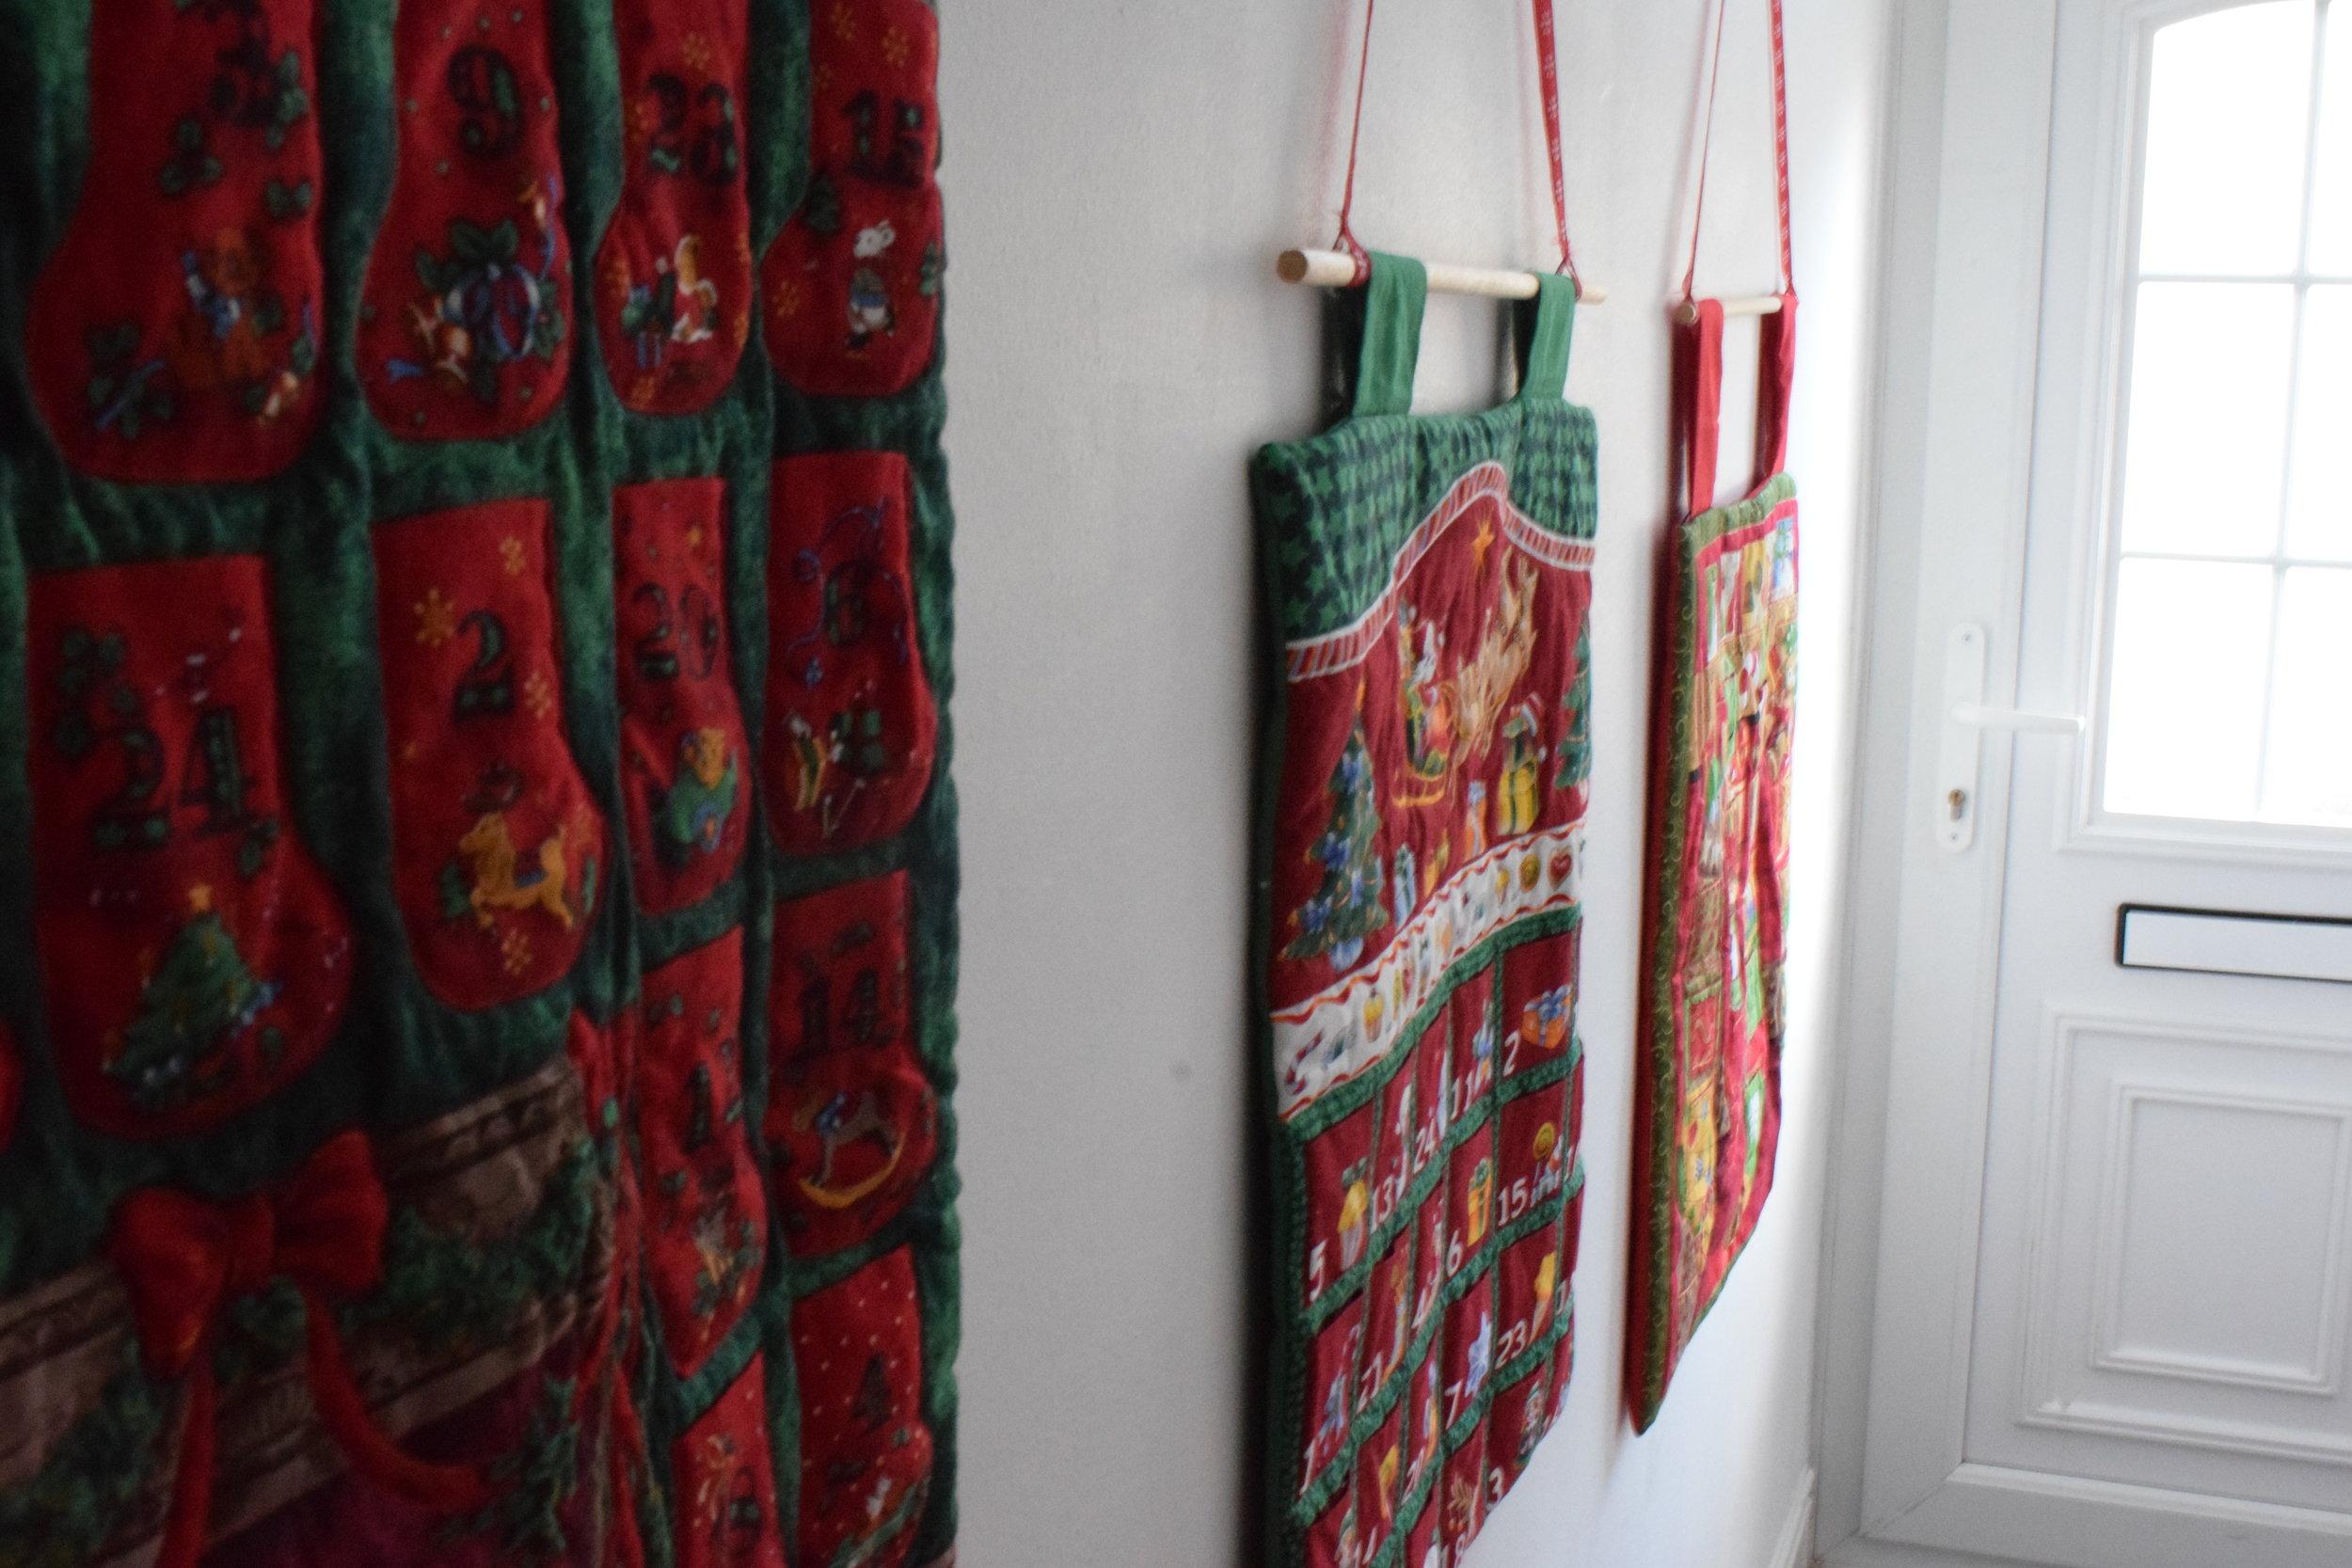 Handmade DIY advent calendars